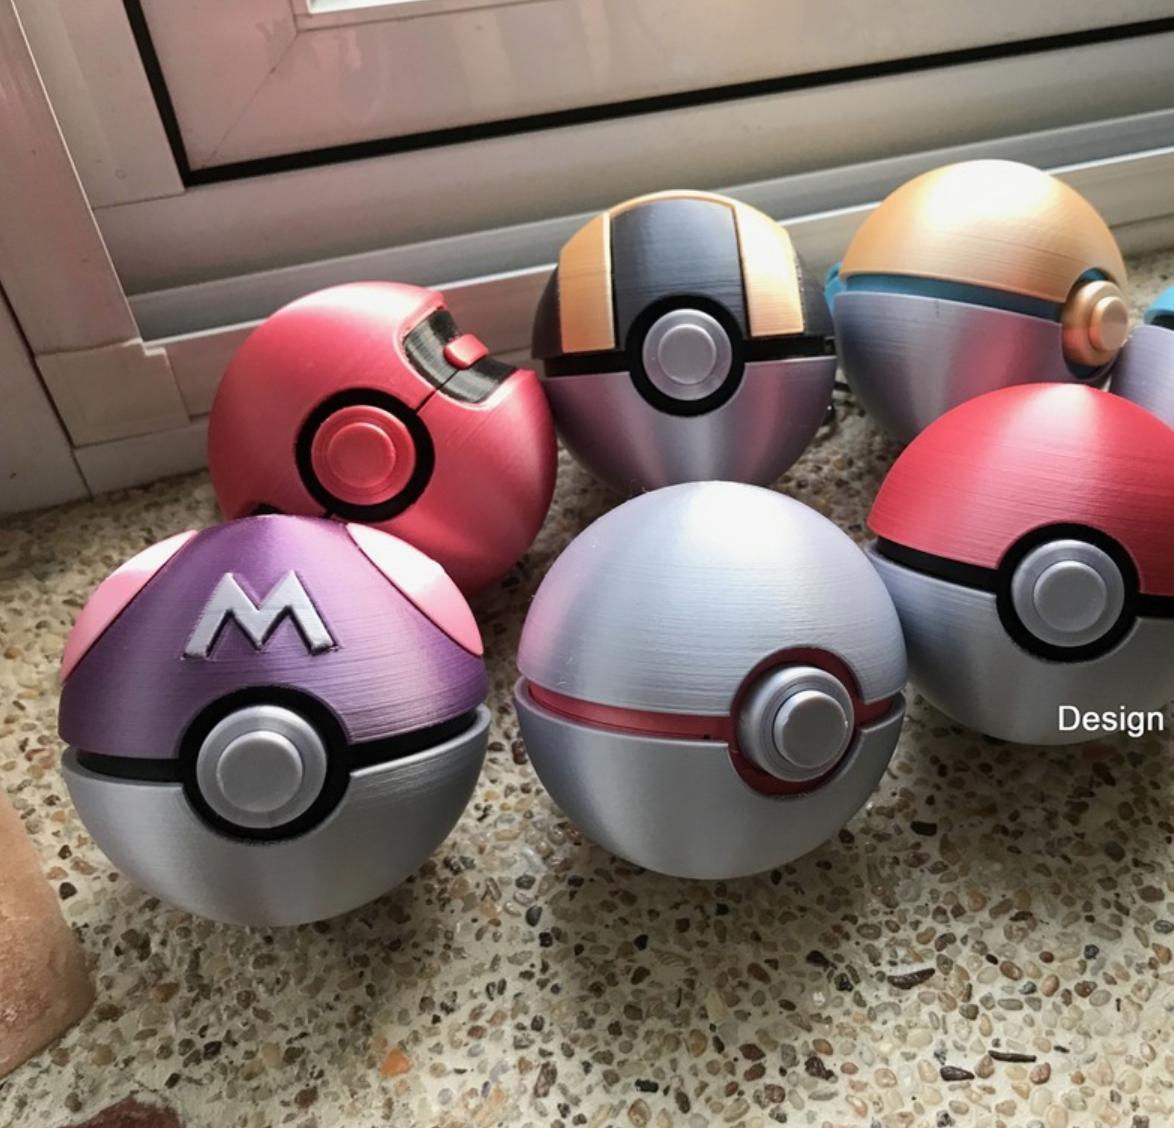 Capture d'écran 2018-01-17 à 14.19.51.png Download free STL file Pokemon Tretta - Mini collection box • 3D printer object, cycstudio